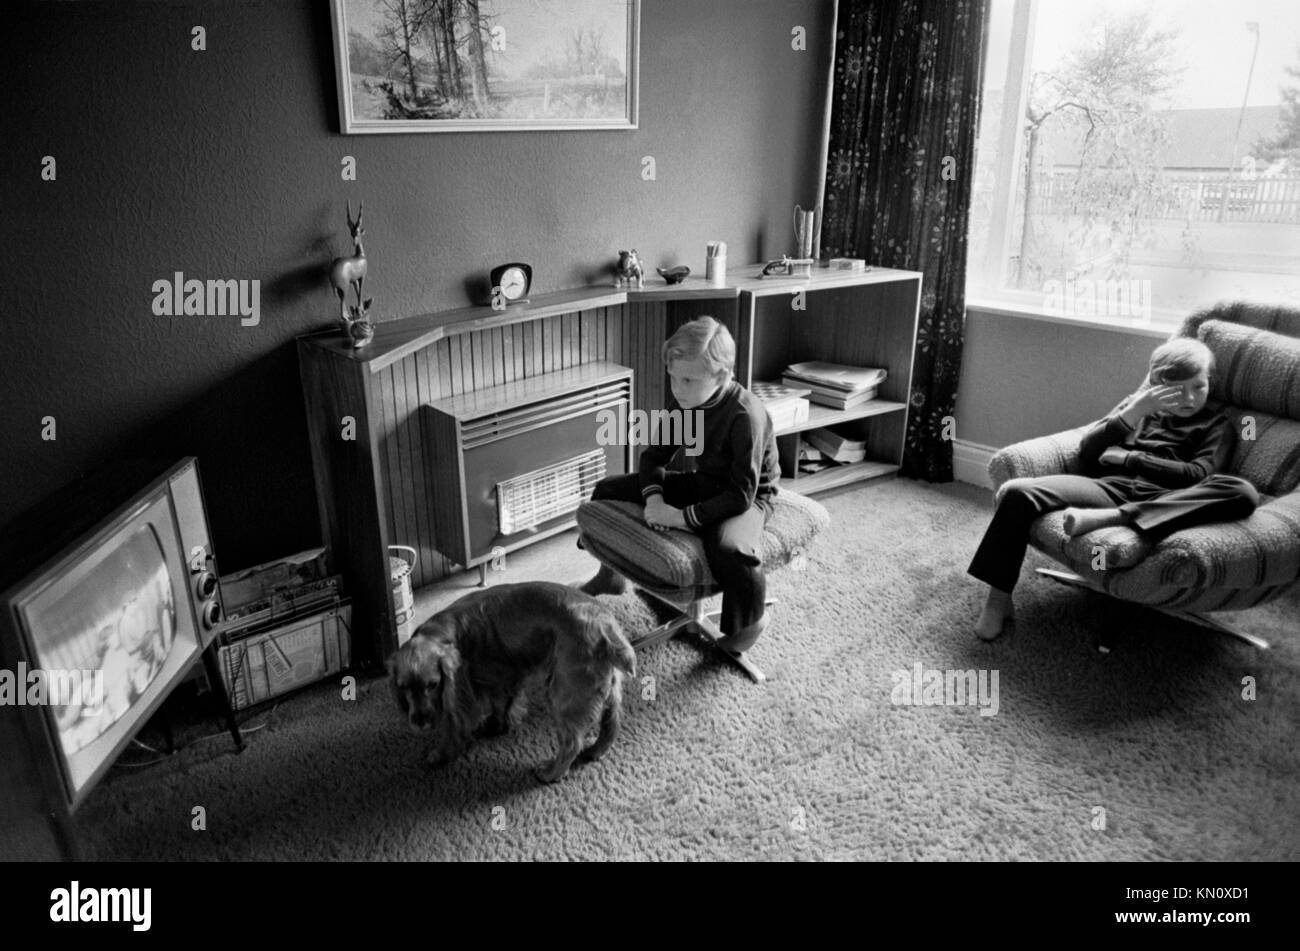 Kinder Fernsehen TV UK 1970s Mittelklasse Familie zu Hause Interieur des Hauses. 70 s England HOMER SYKES Stockbild